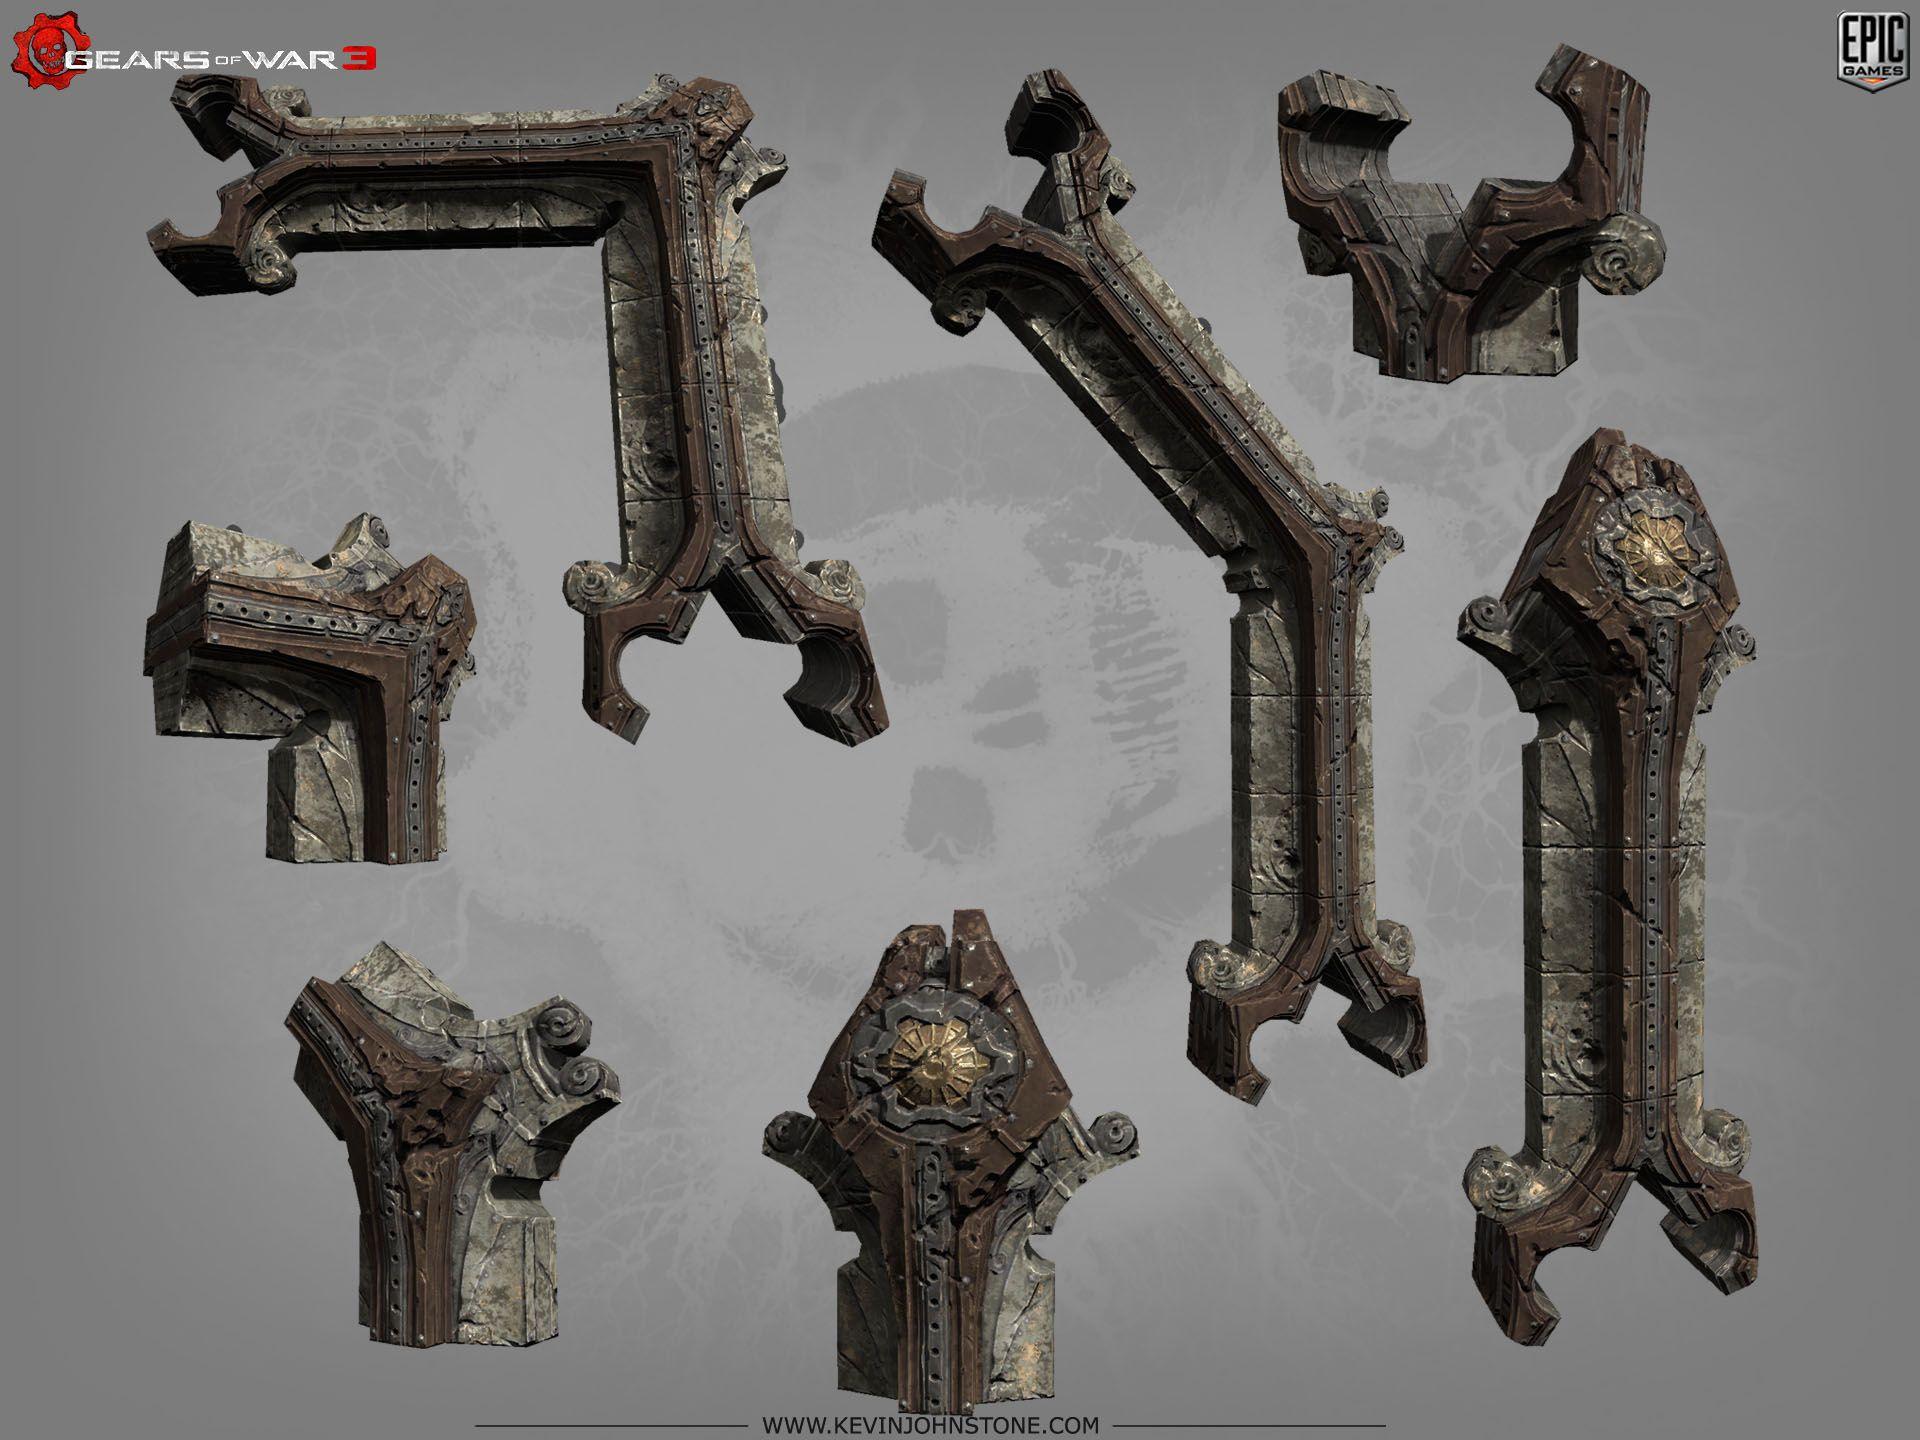 G3_Spirelows2.jpg (1920×1440) Gears of War 3 by Kevin Johnstone http://www.kevinjohnstone.com/